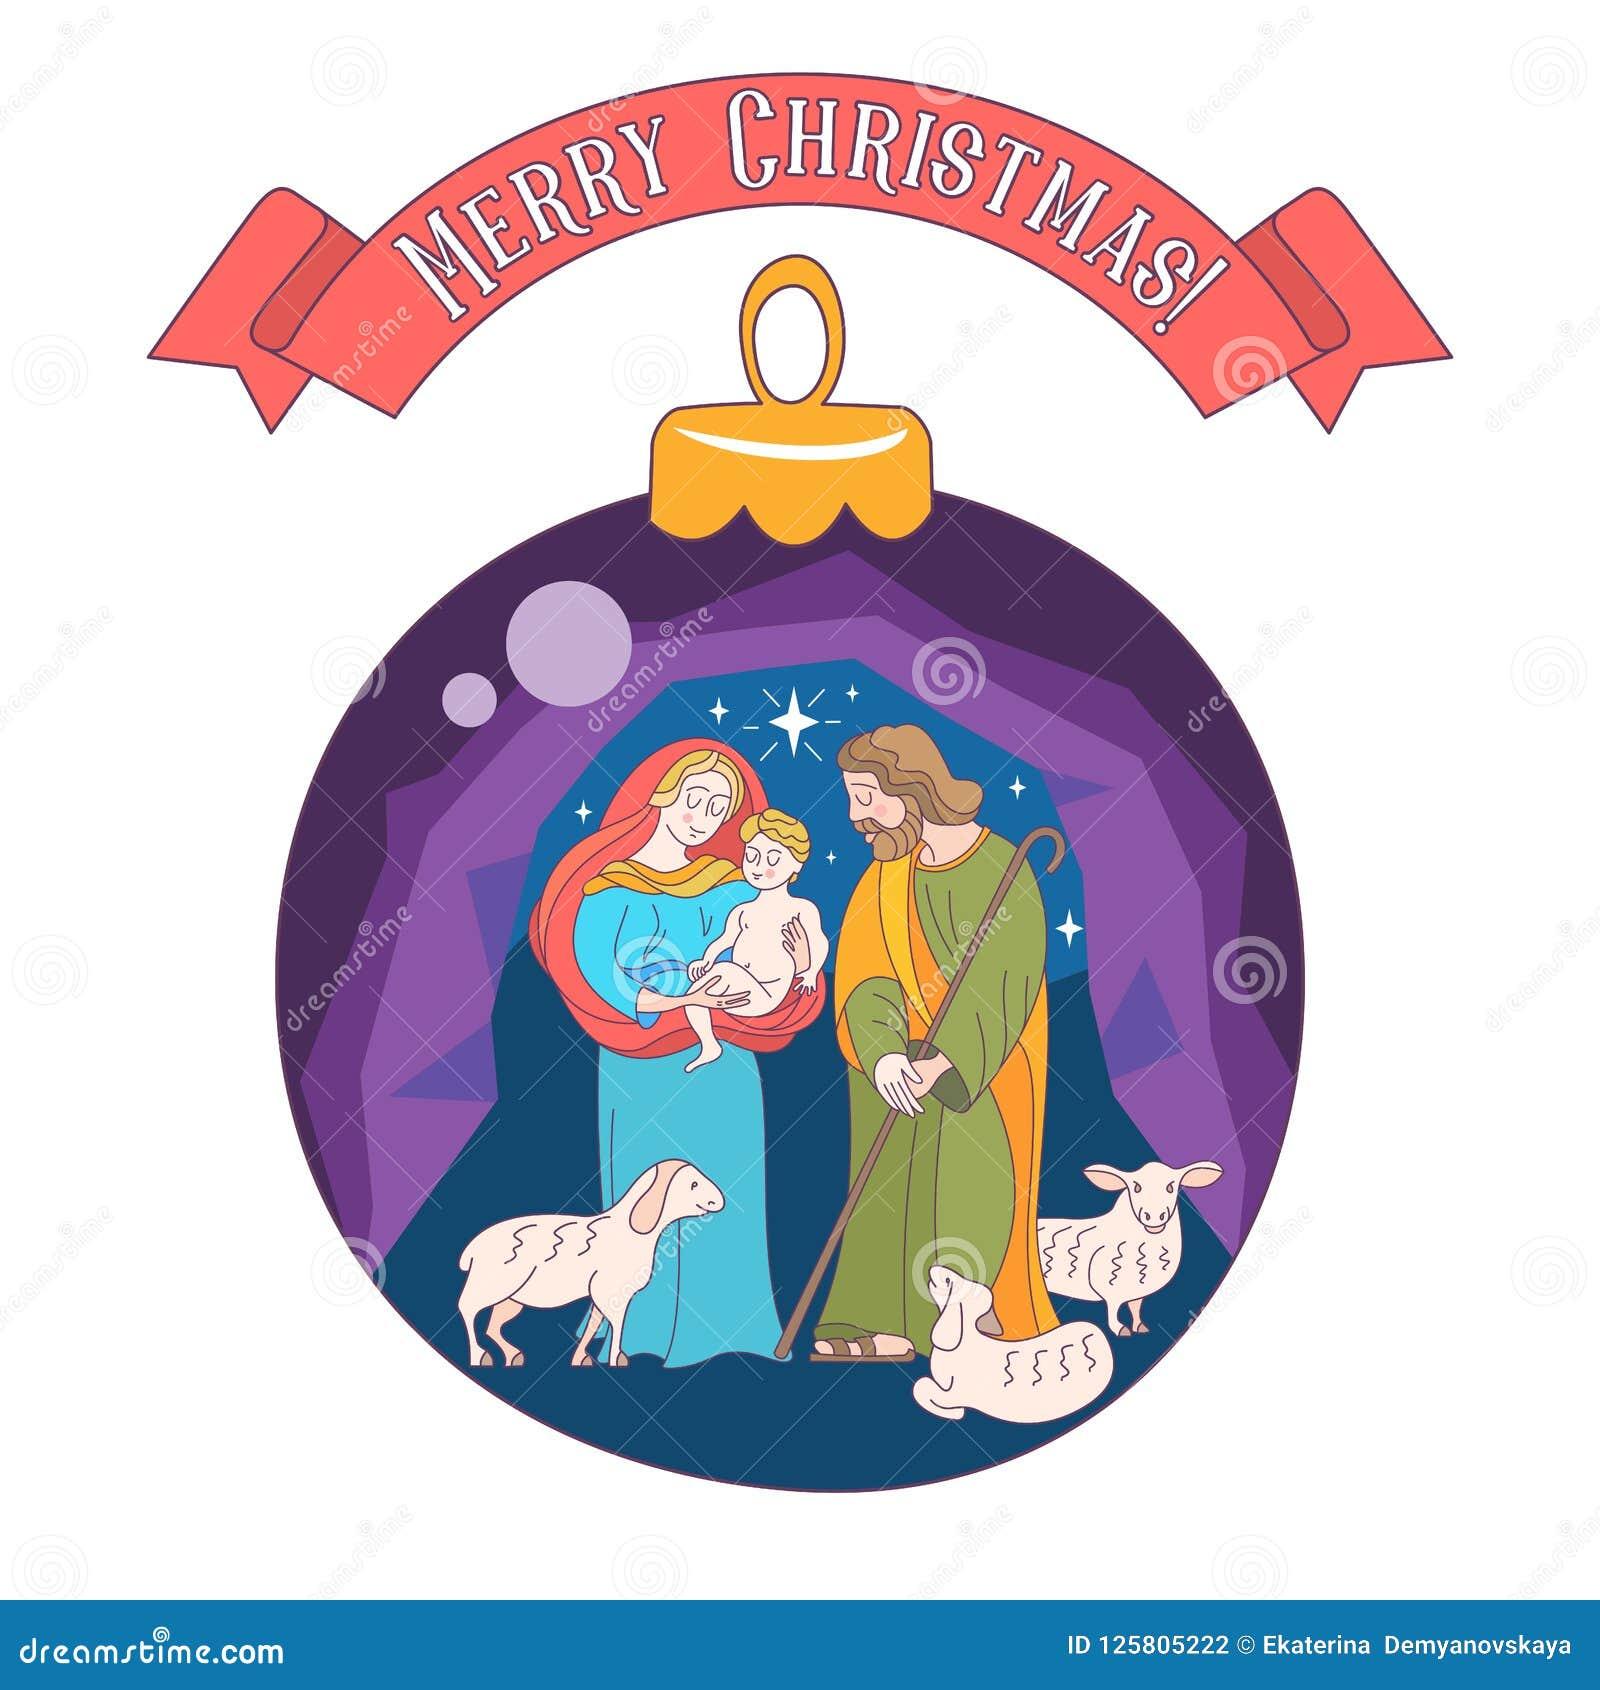 Merry christmas vector greeting card virgin mary baby jesus a download merry christmas vector greeting card virgin mary baby jesus a stock vector m4hsunfo